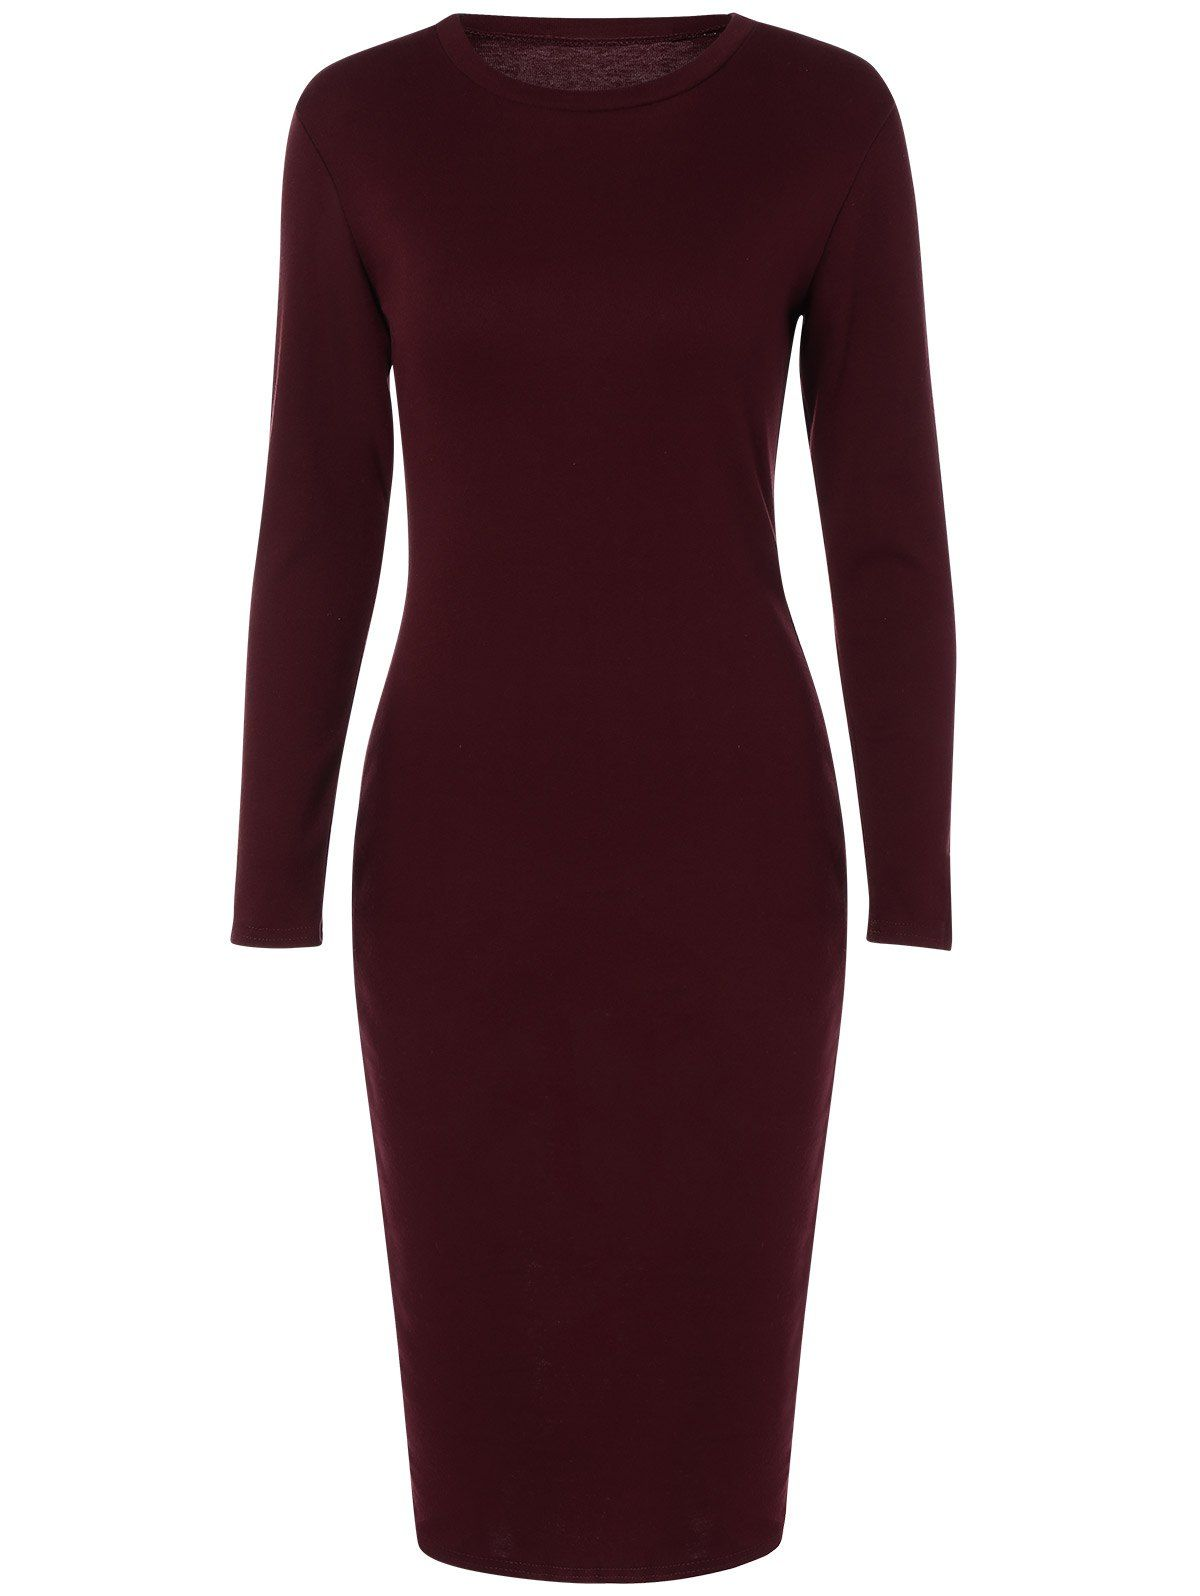 Back slit tight fitted long sleeve dress all pinterest dresses